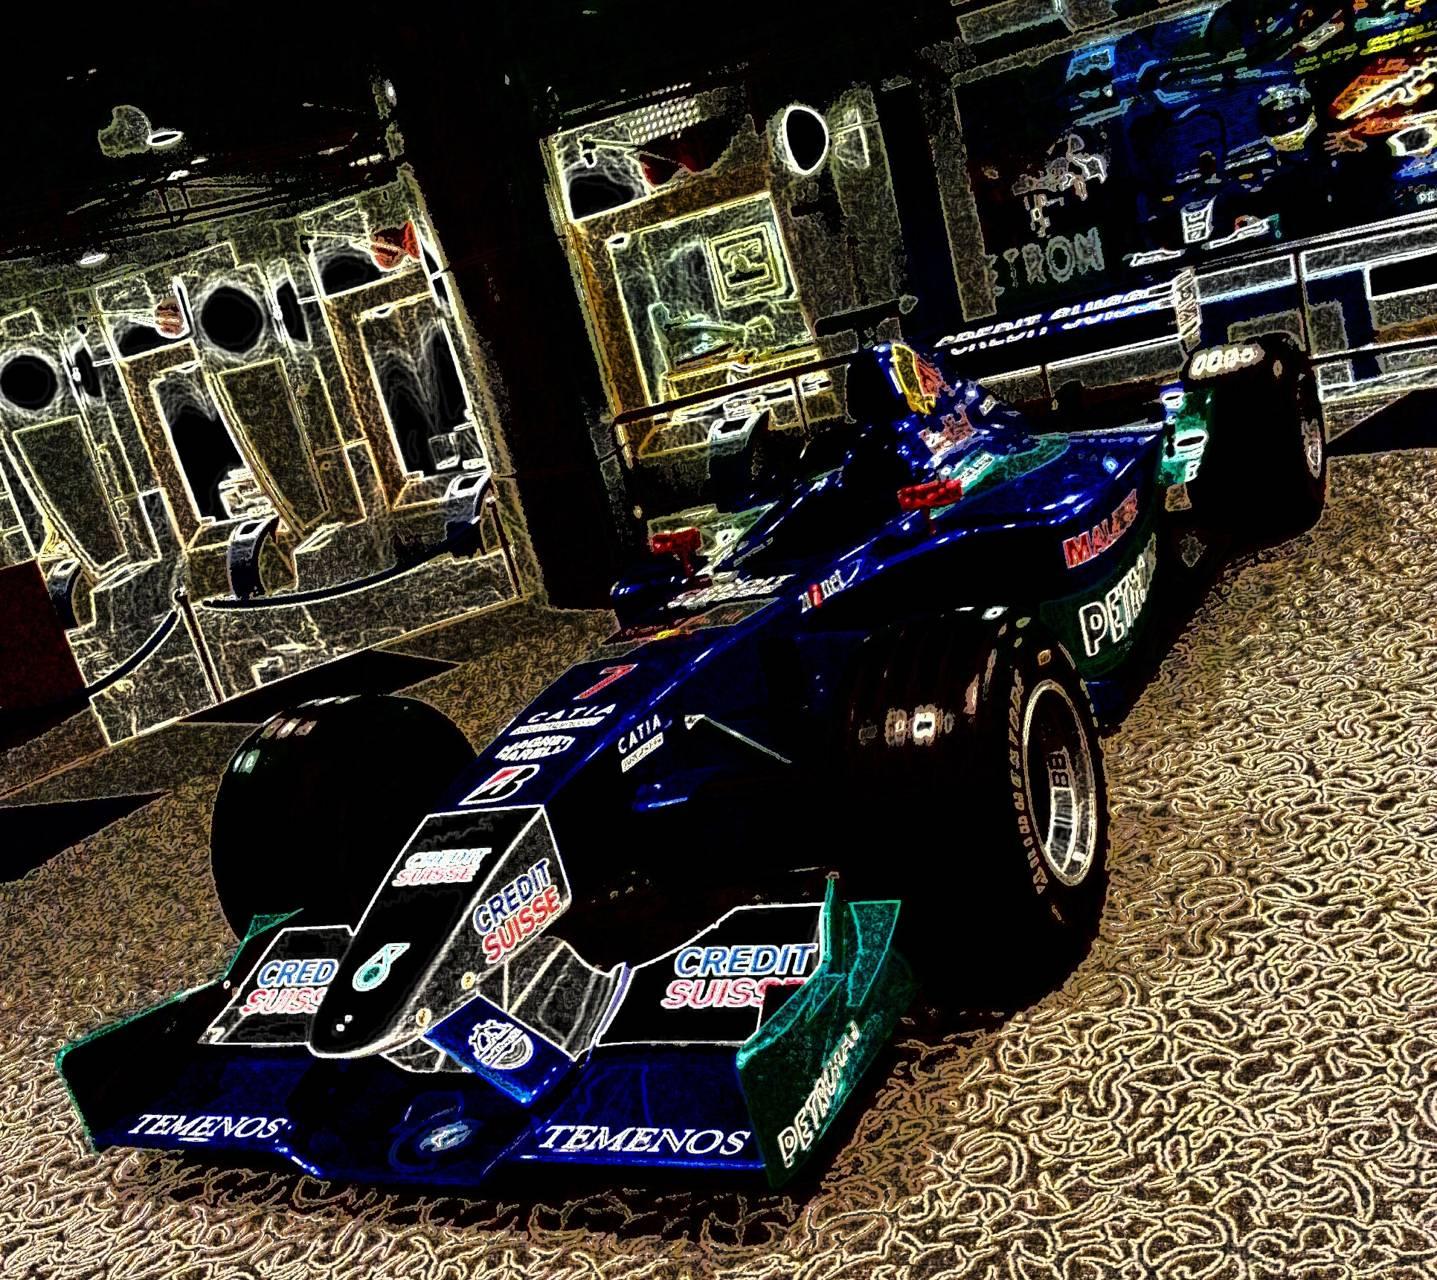 Petronas formula